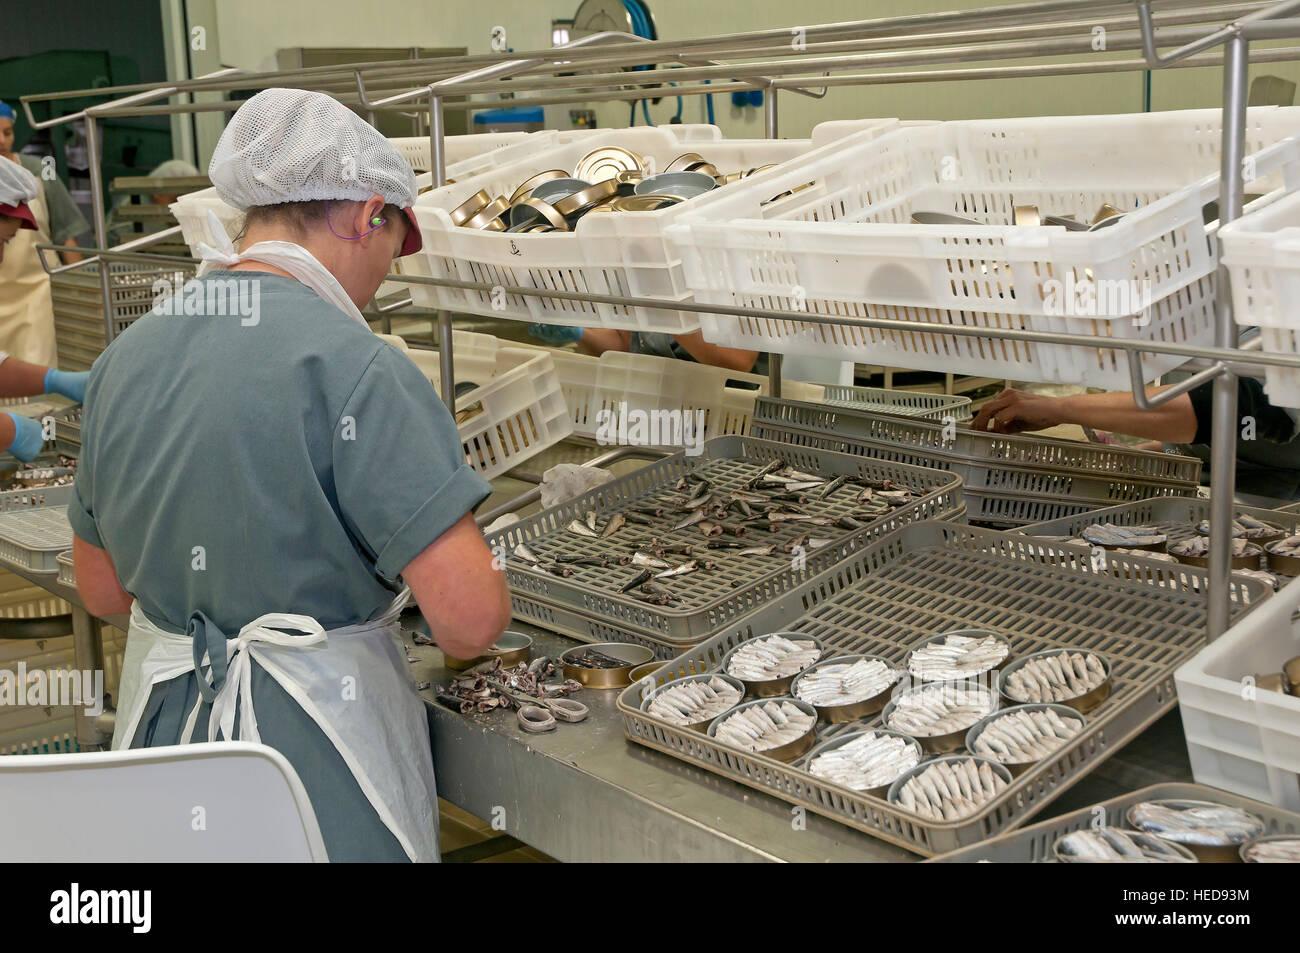 Fish canning industry, Cambados, Pontevedra province, Region of Galicia, Spain, Europe - Stock Image